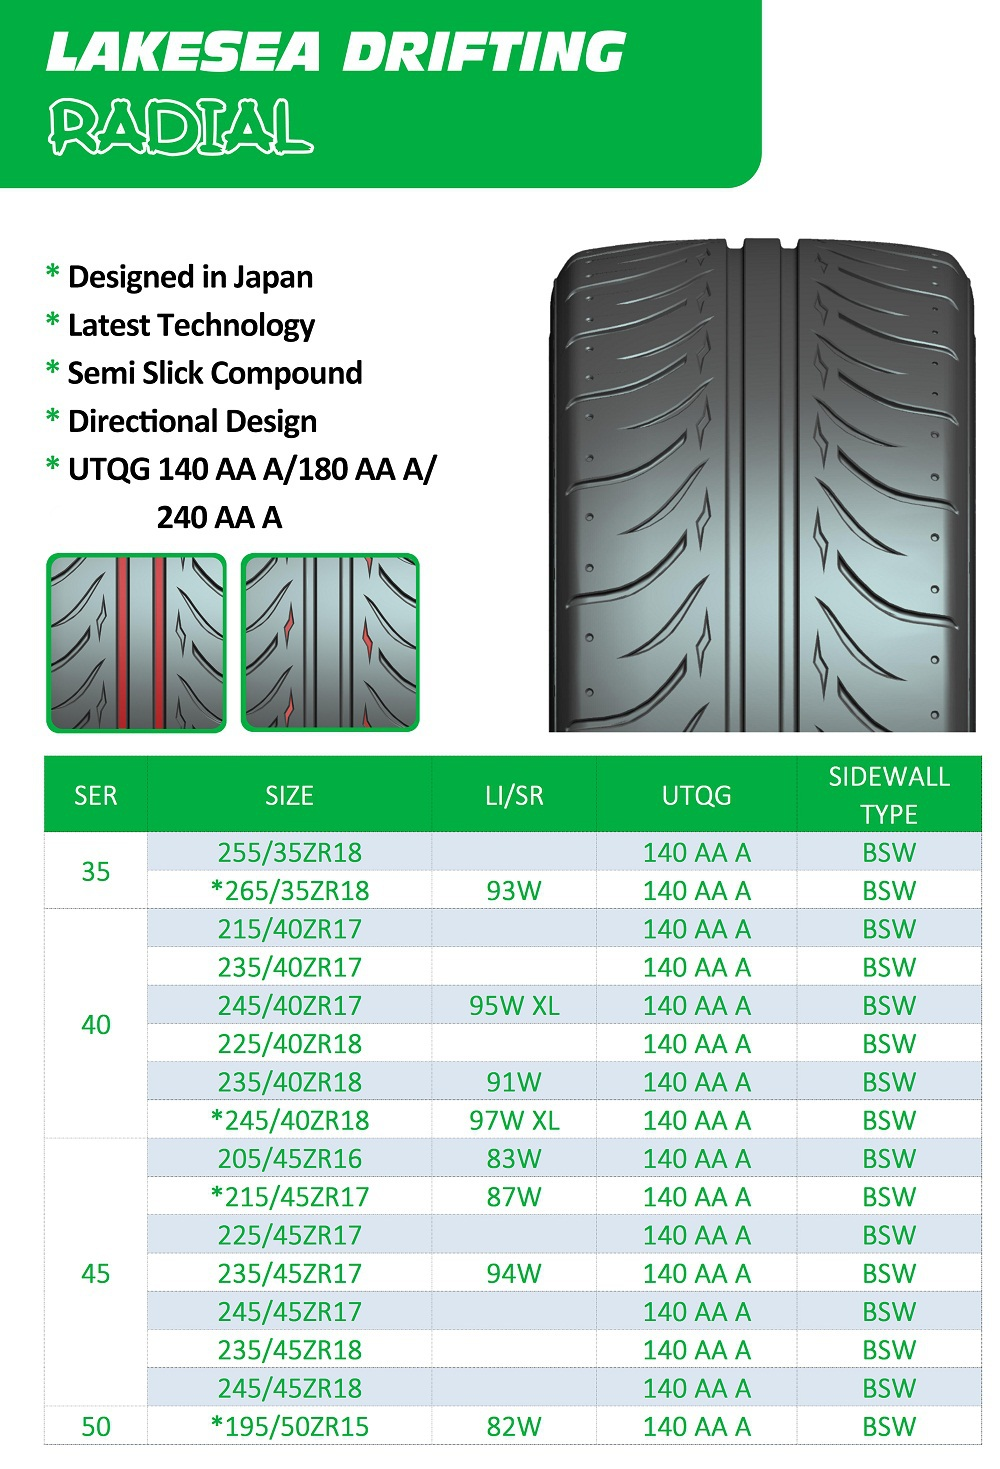 zestino lakesea 195 55 15 85 v racing semi slick tires 15 slicks drift tires 140aa a 180aa a. Black Bedroom Furniture Sets. Home Design Ideas